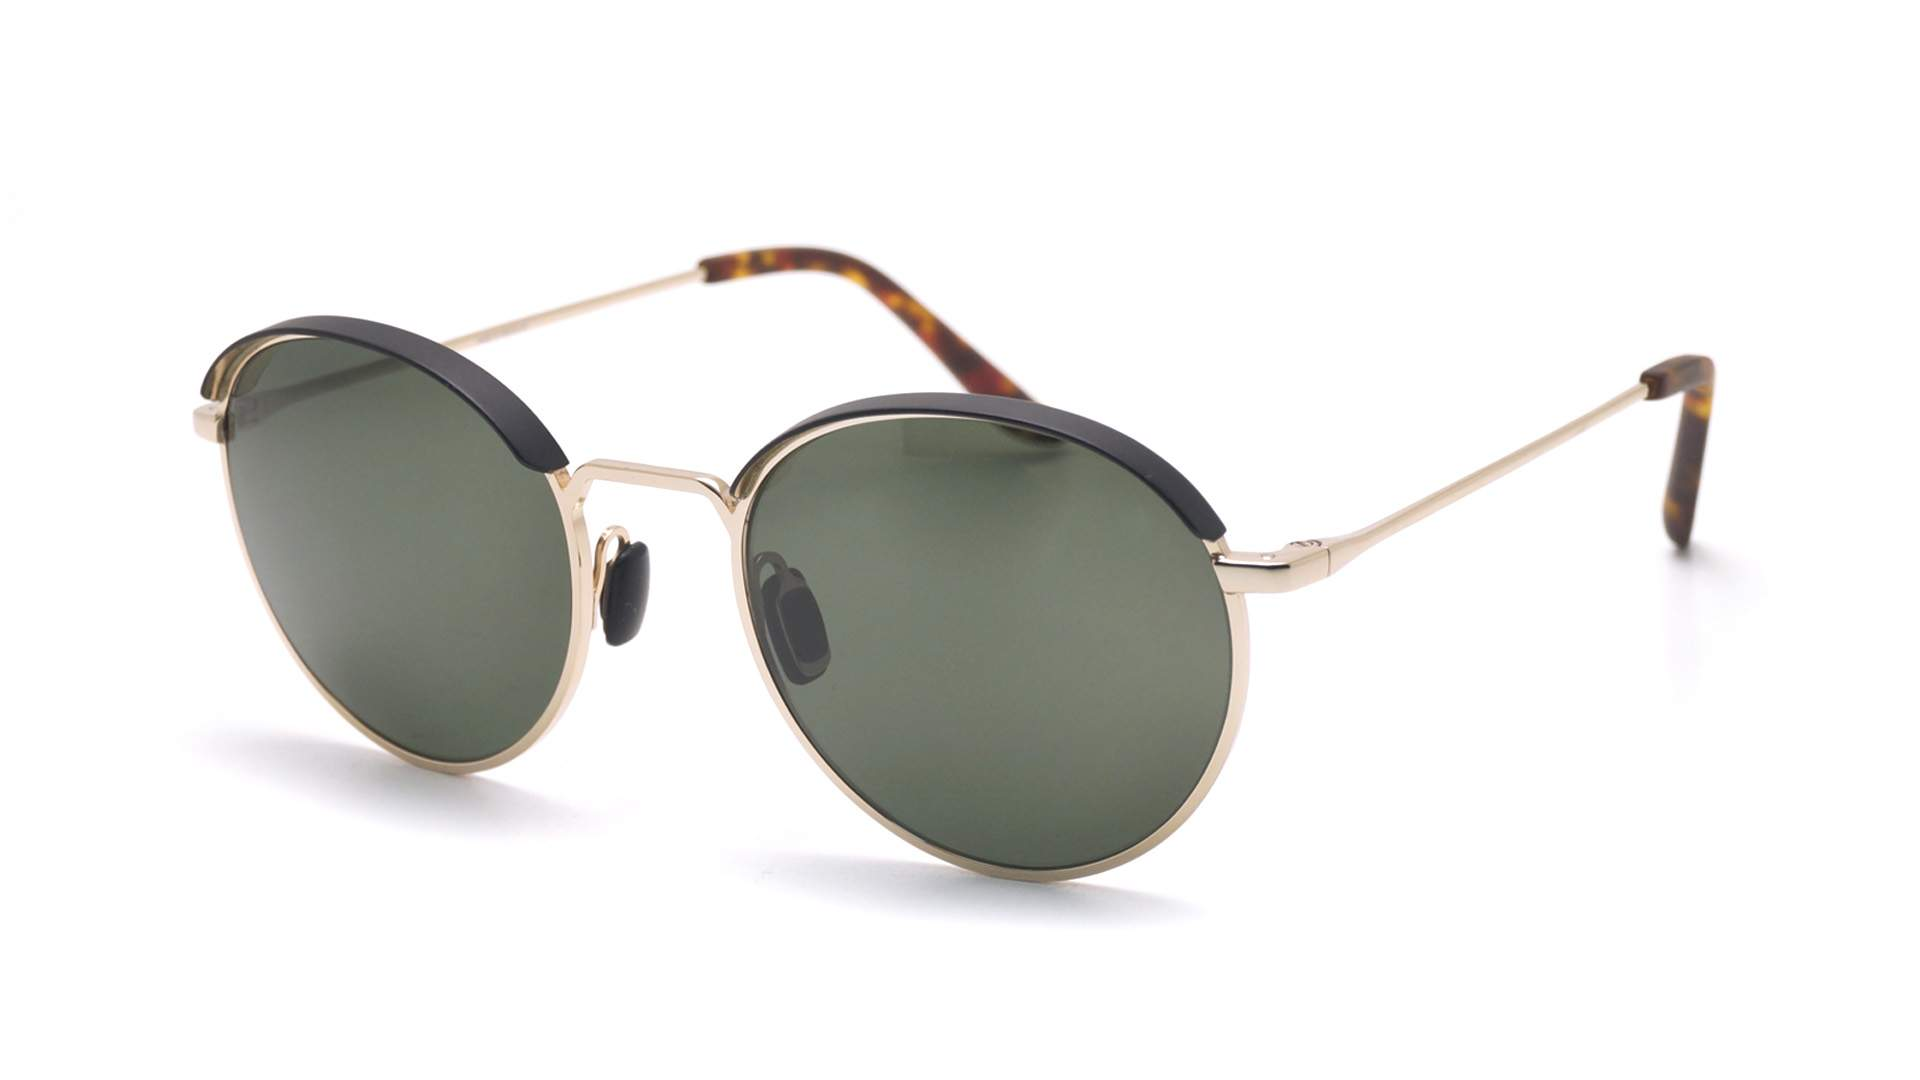 c164116638 Sunglasses Vuarnet Cap Pantos Gold Pure grey VL1814 0001 1121 53-18 Medium